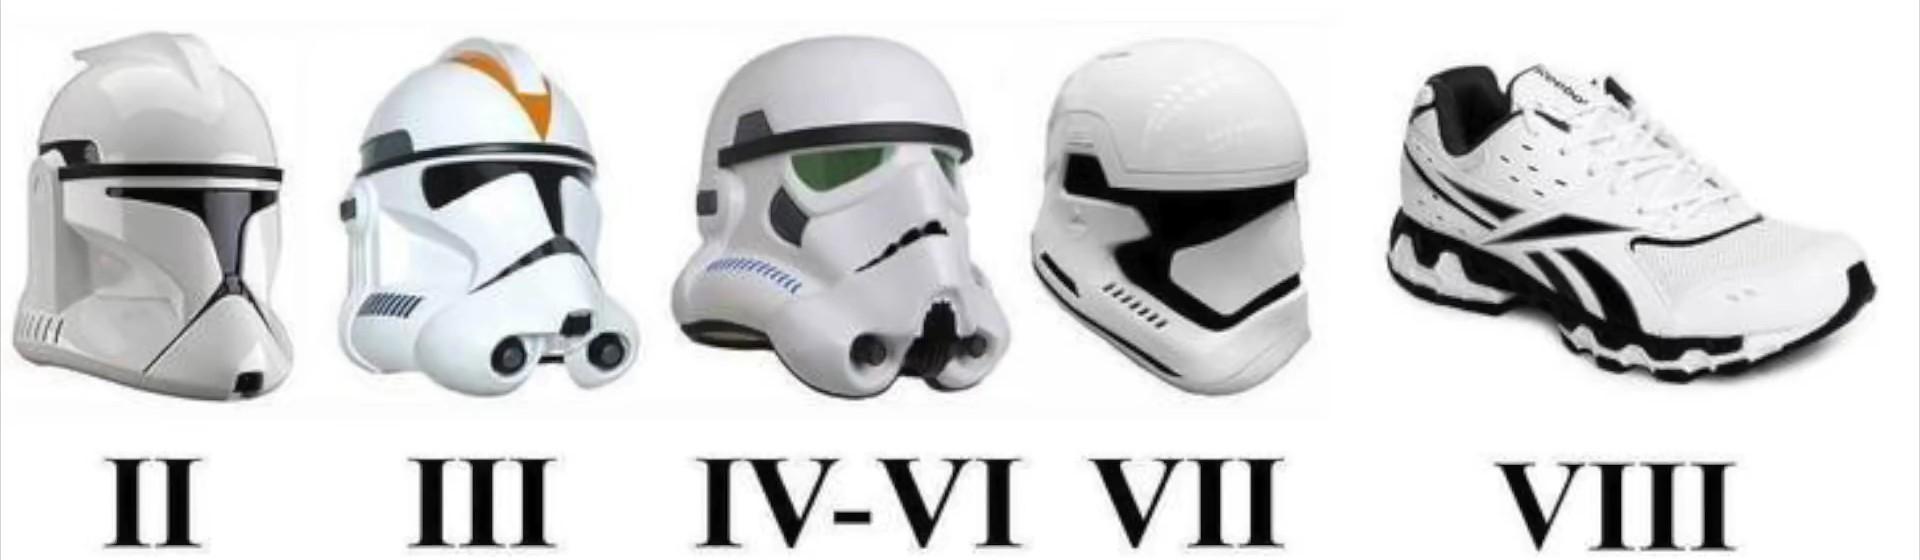 Evolucion del clontrooper :v - meme